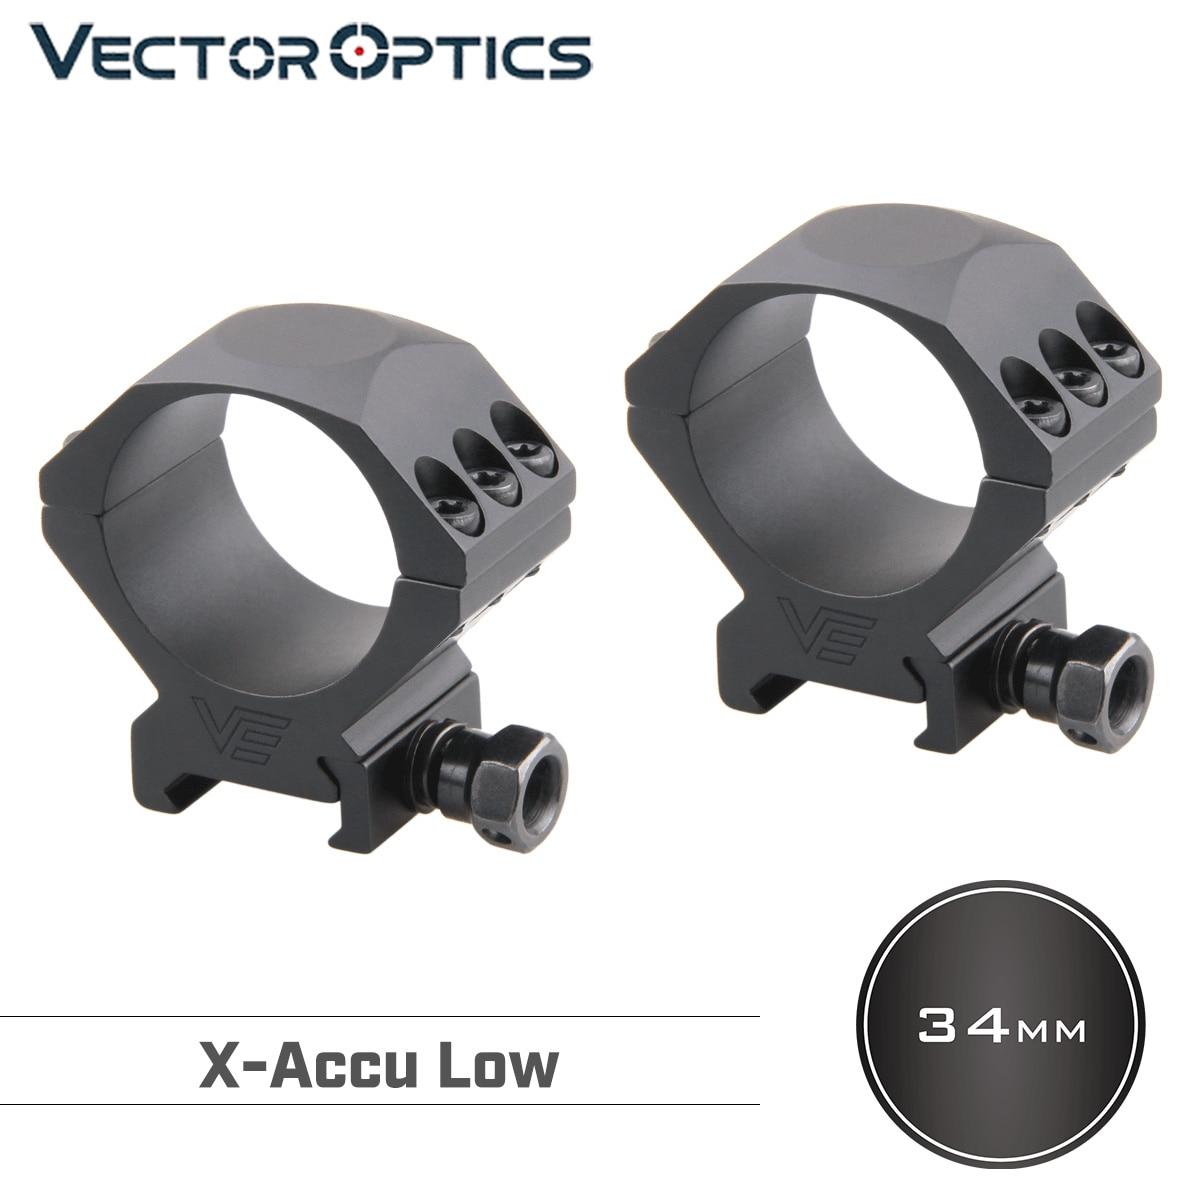 Vector Optics 34mm x-exact Low RIflescope Mount Rings Picatinny 21mm alta calidad seis pernos 1,1 pulgadas de altura